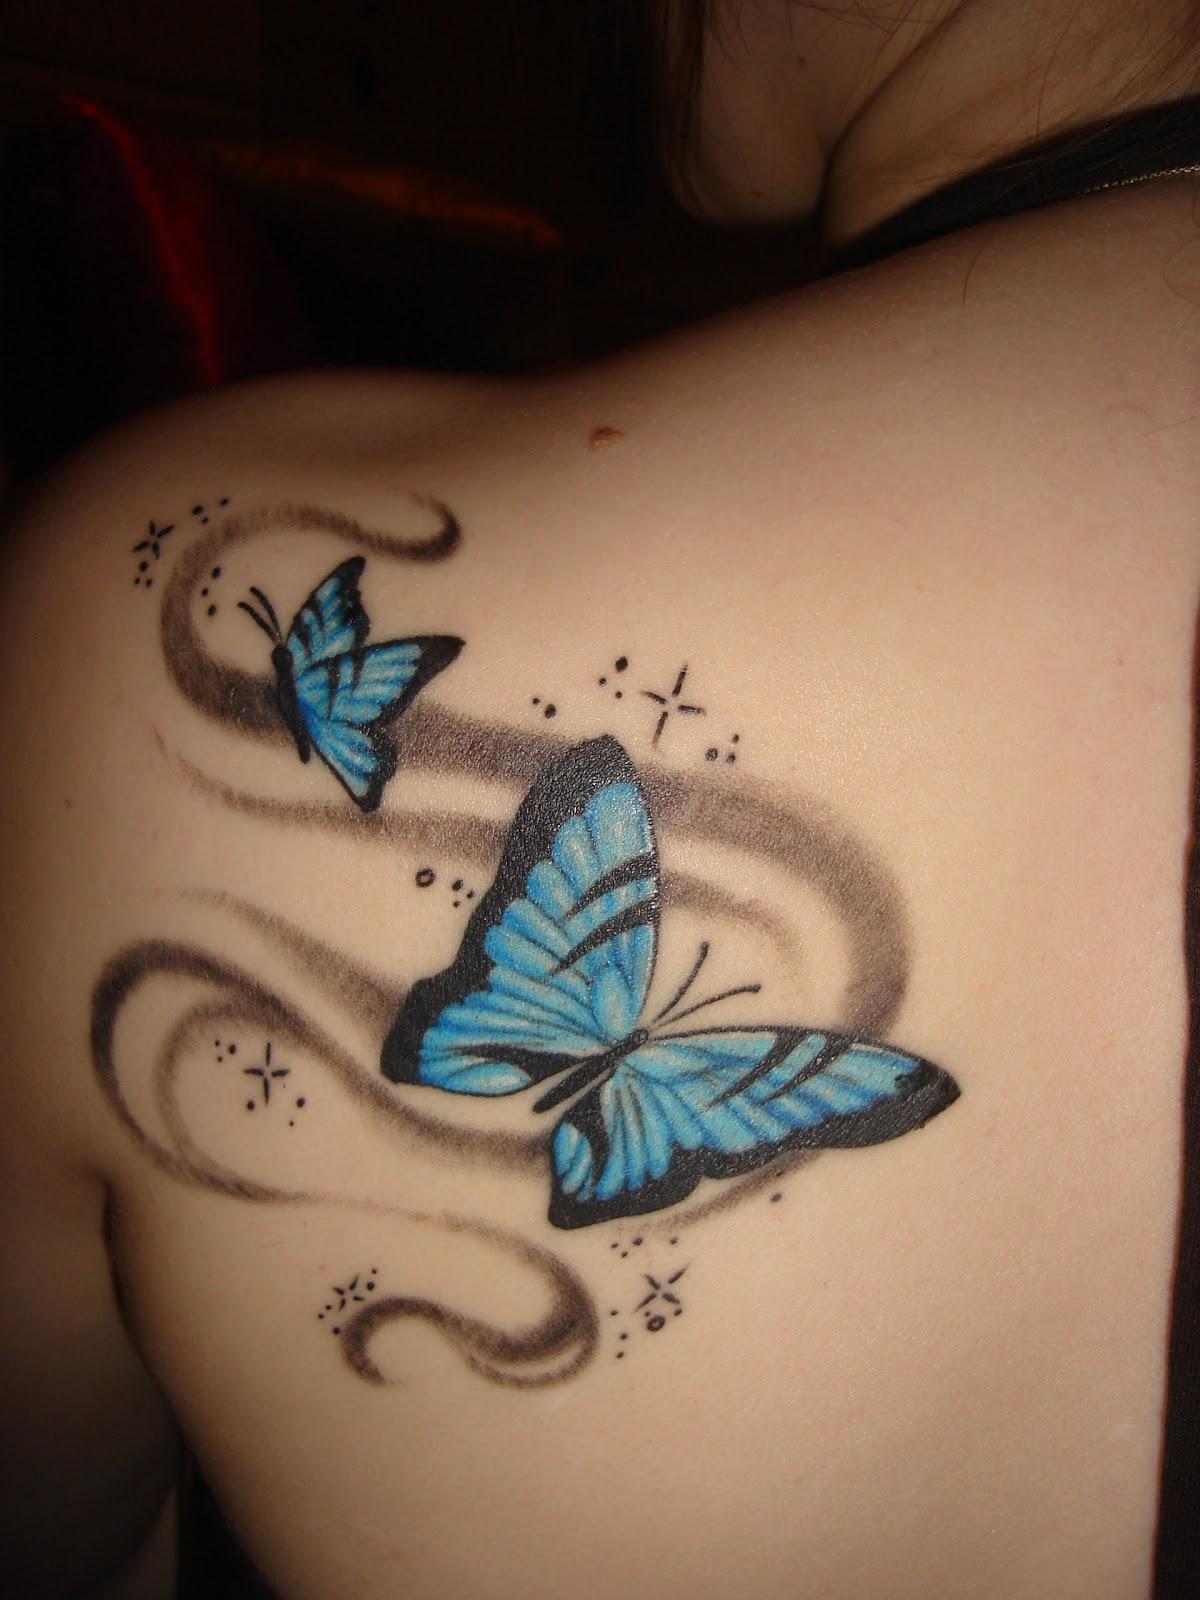 modele de tatouage papillon. Black Bedroom Furniture Sets. Home Design Ideas